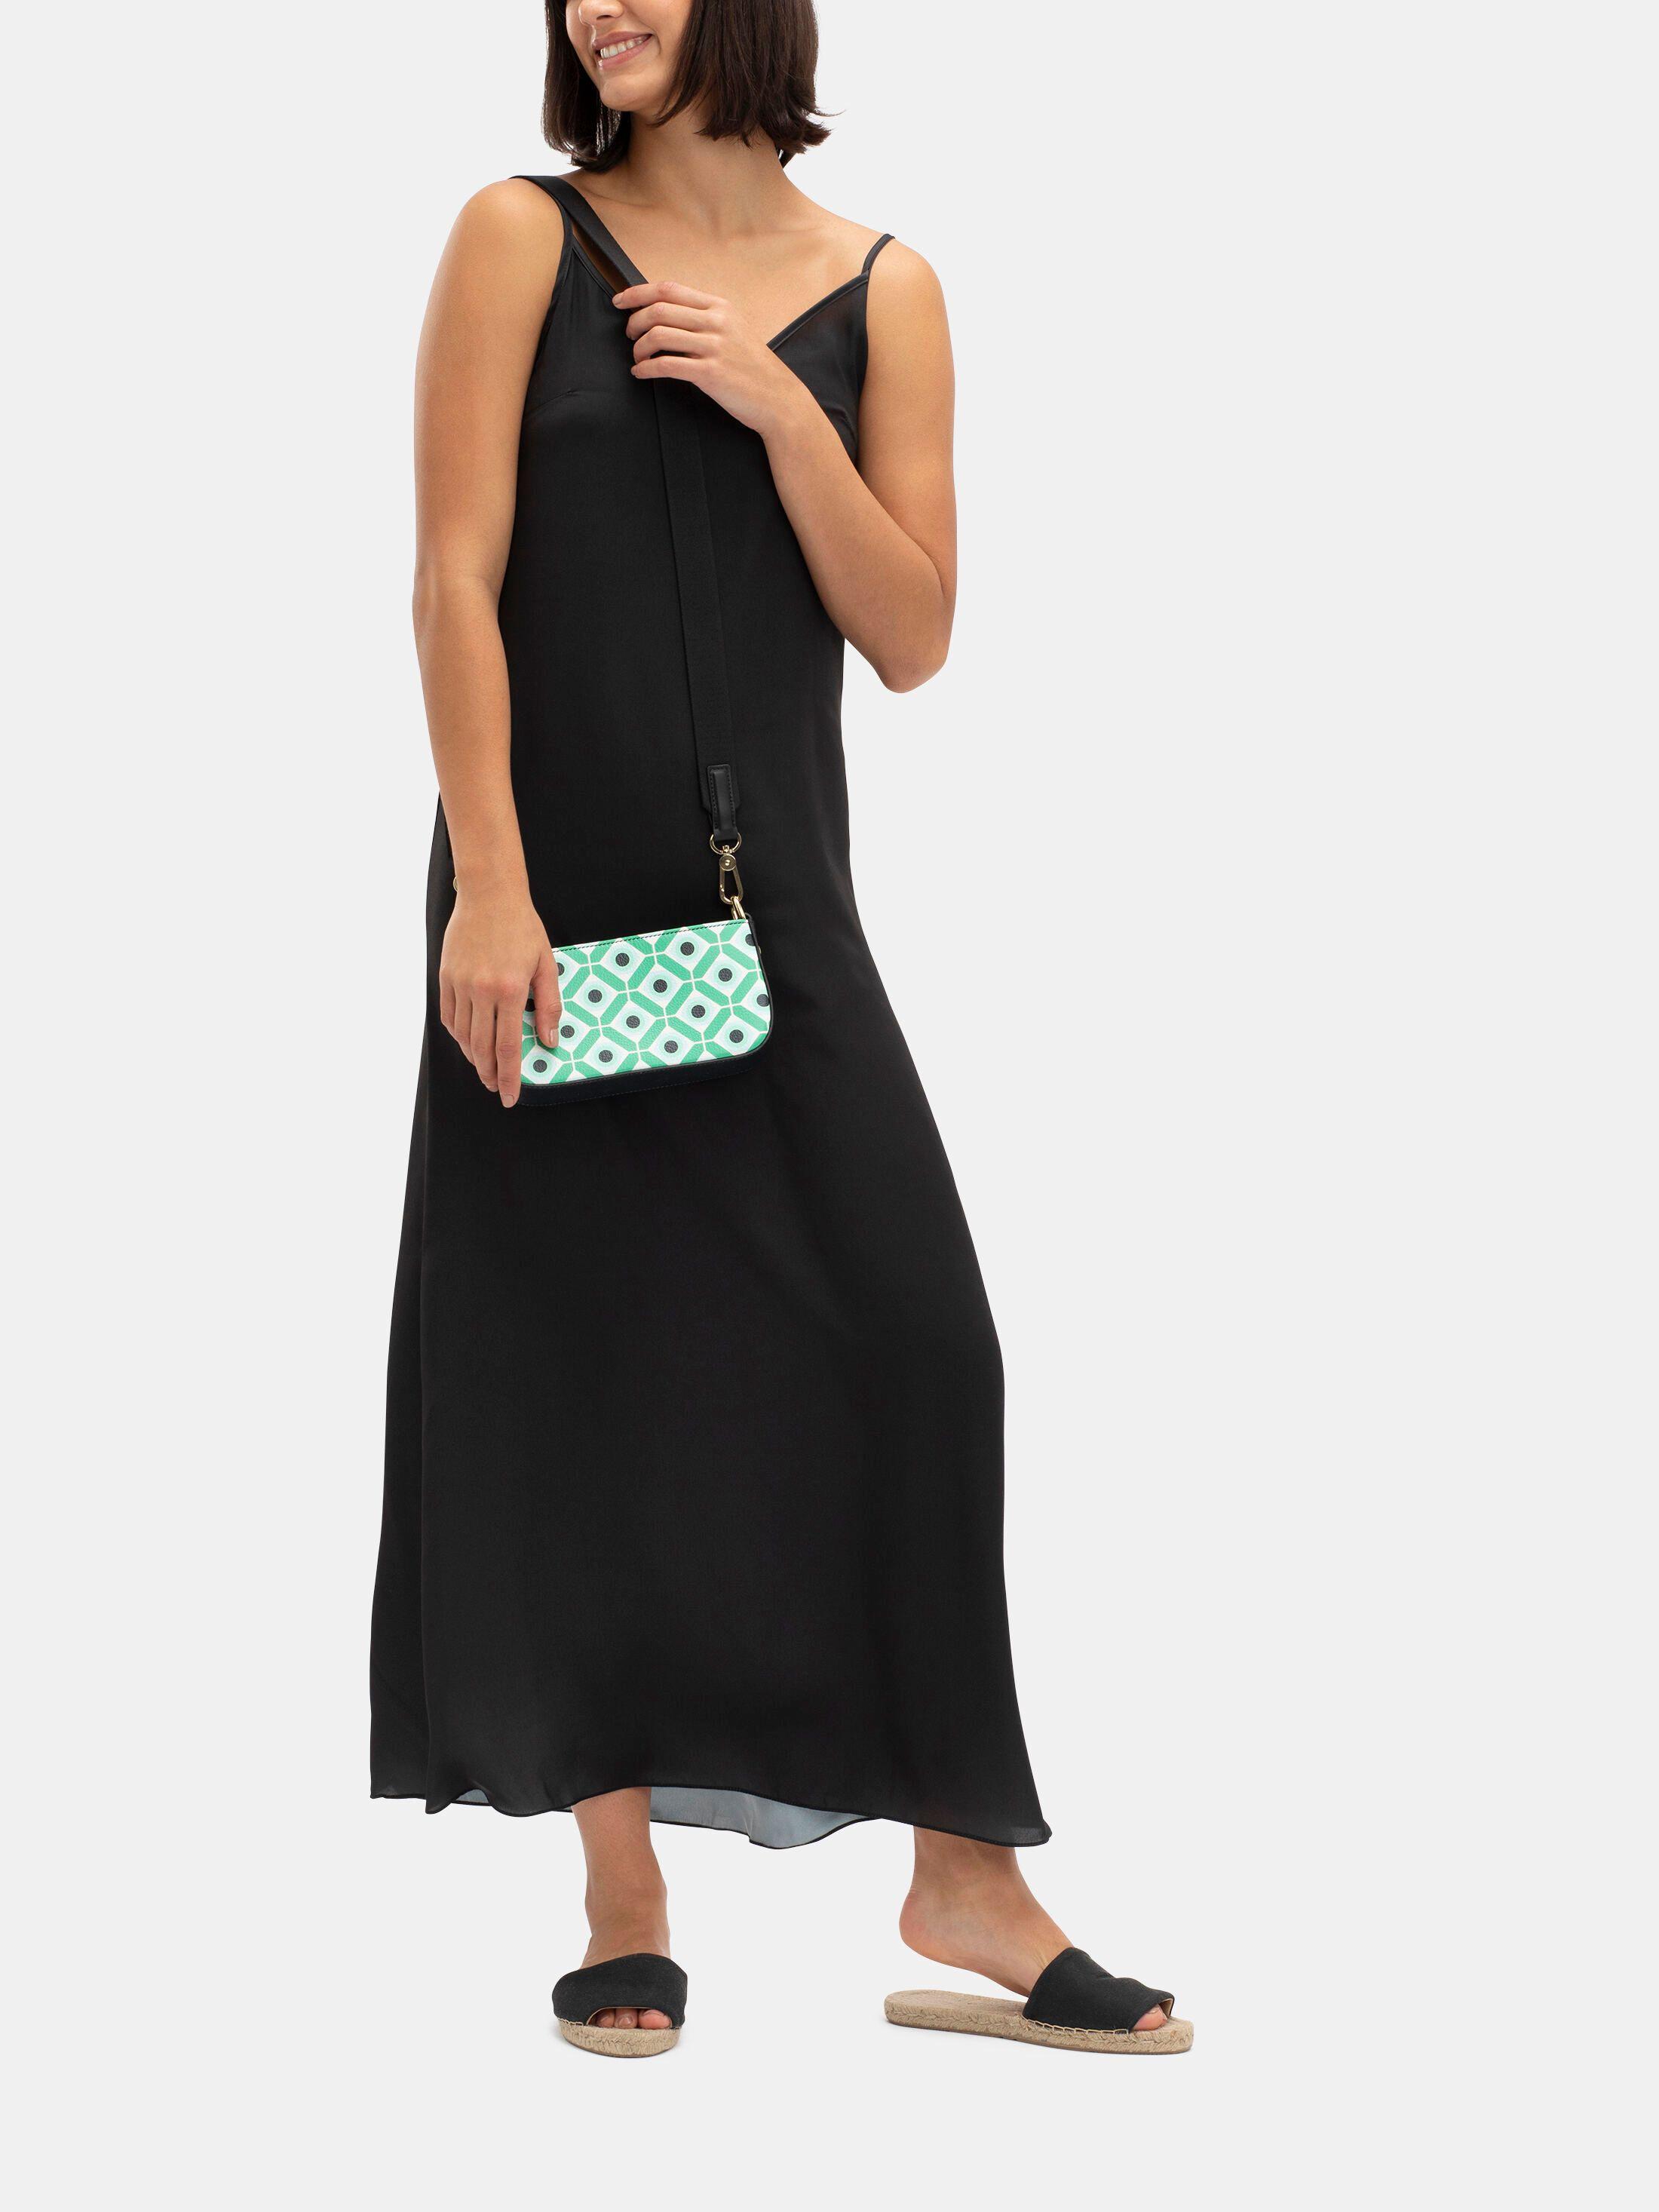 design your own Zip Box Bag